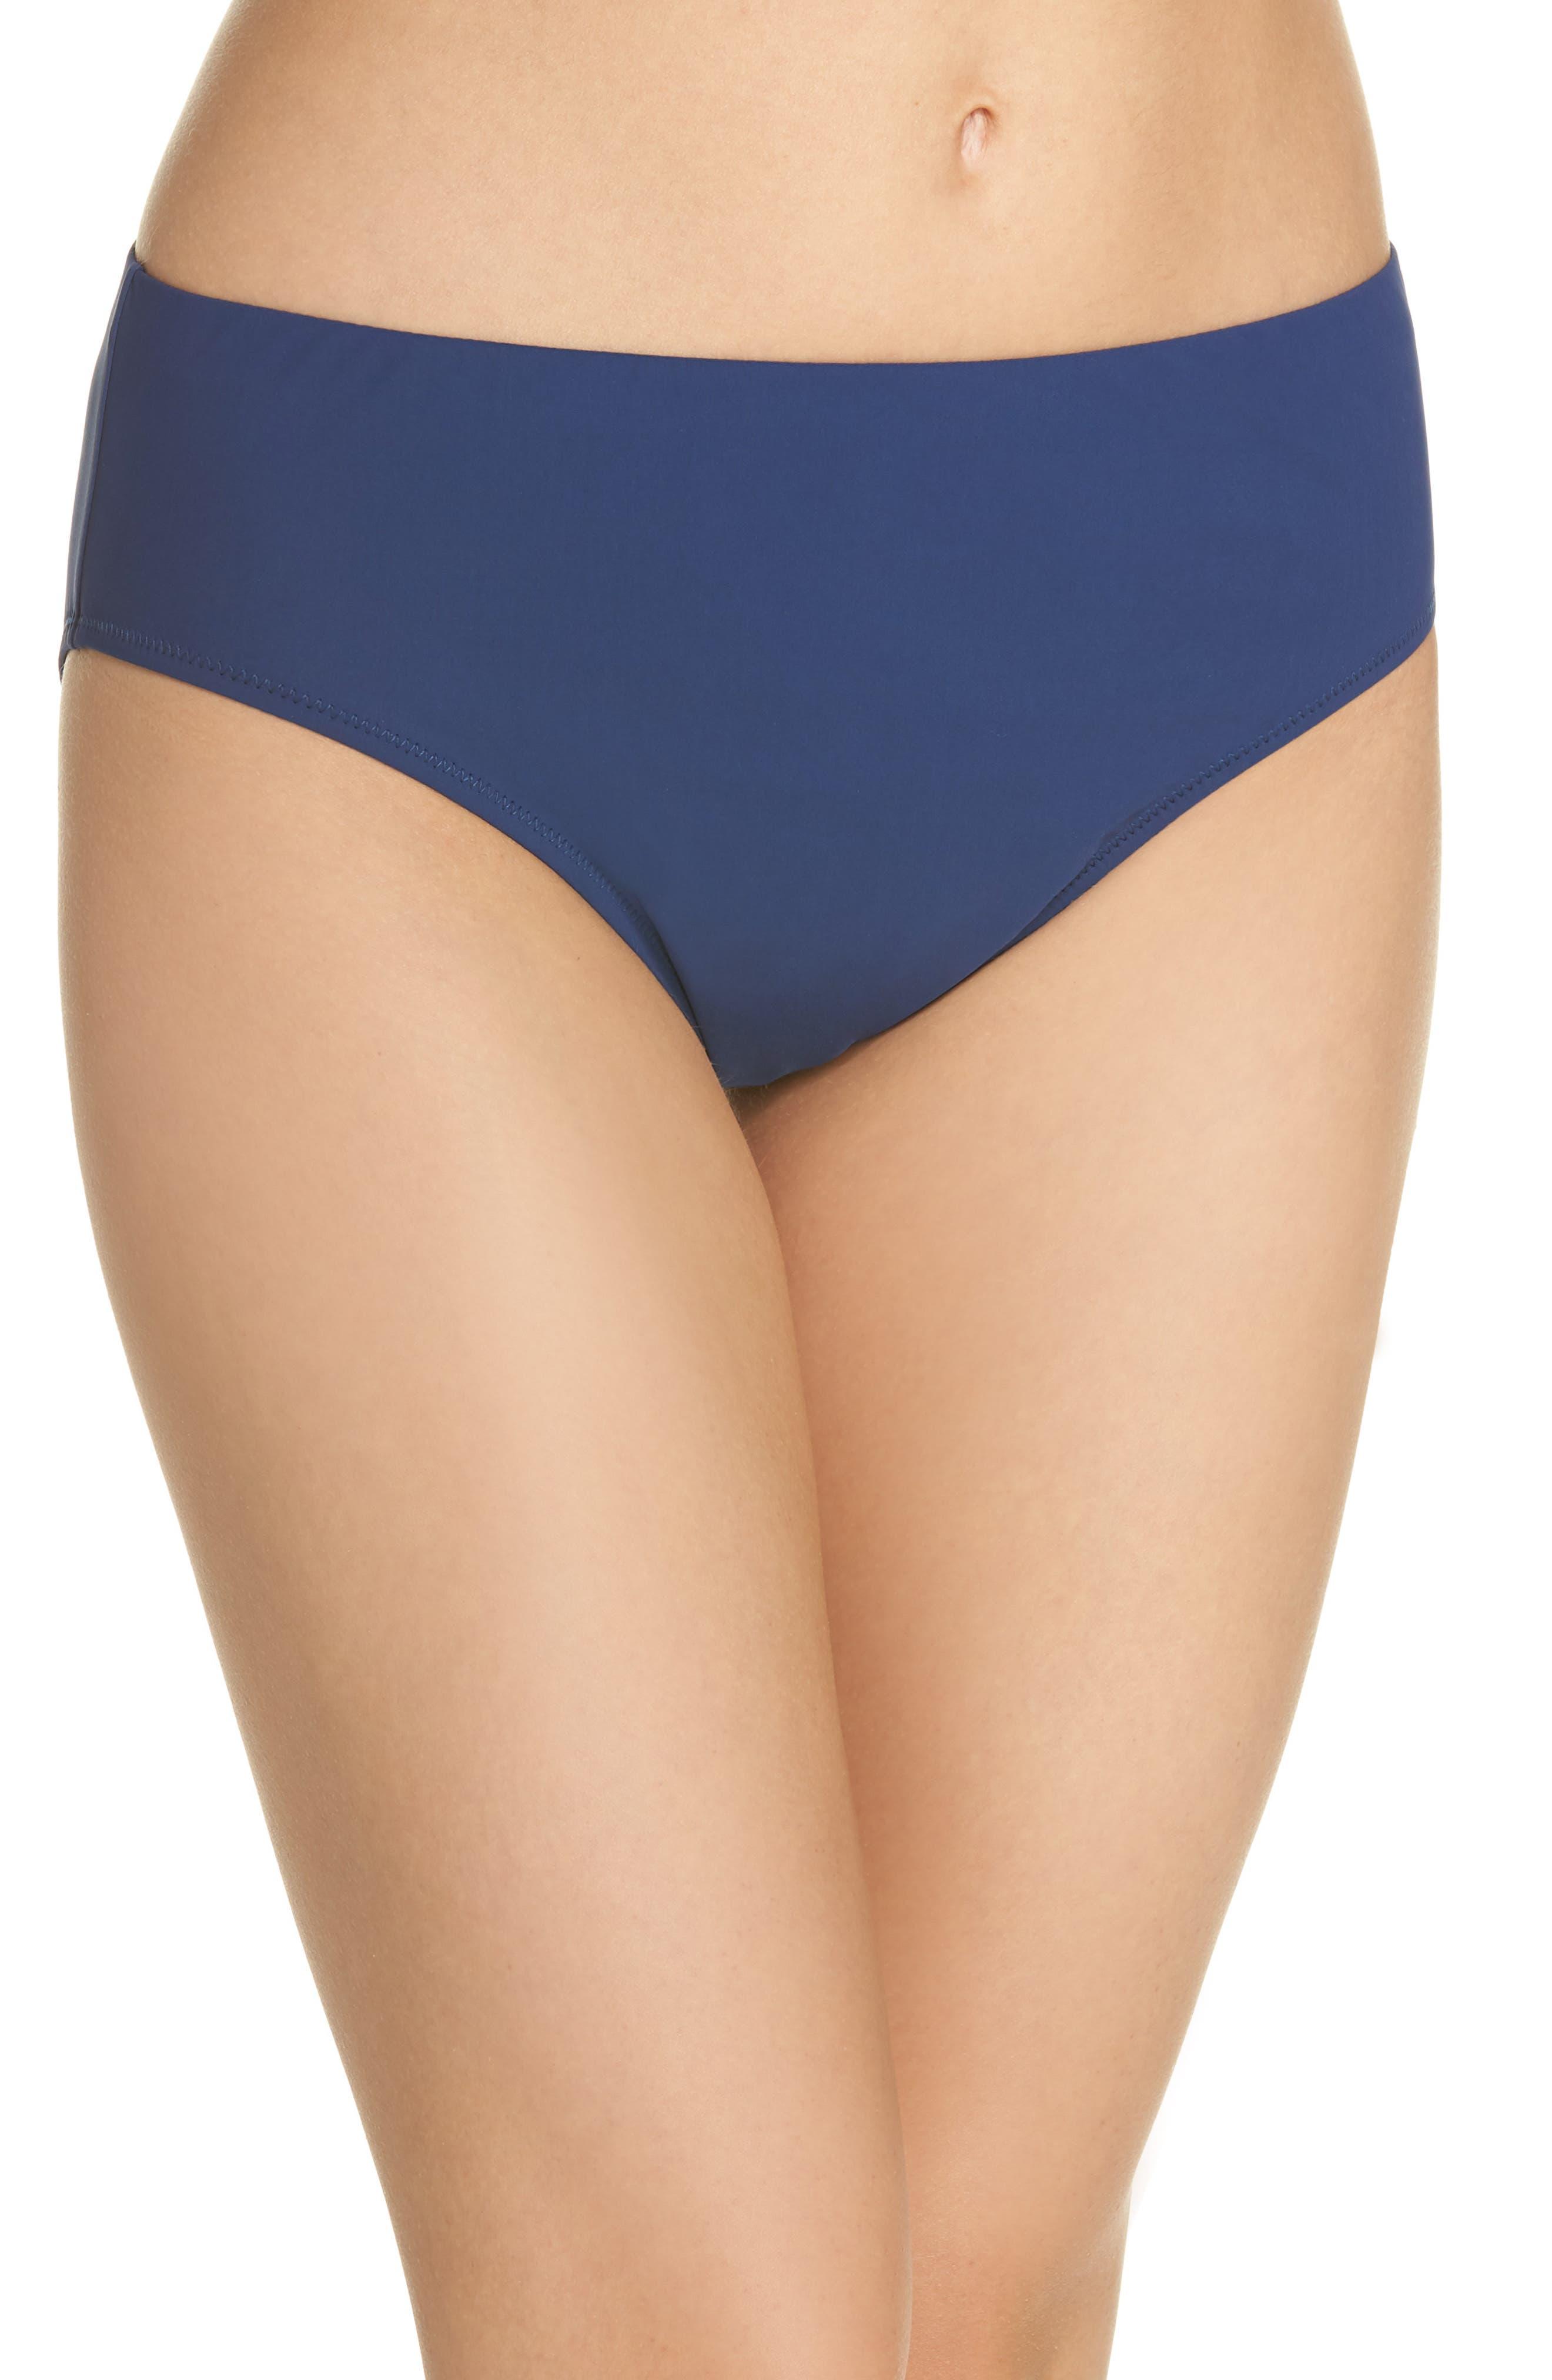 PROFILE BY GOTTEX Hipster Bikini Bottoms, Main, color, 427